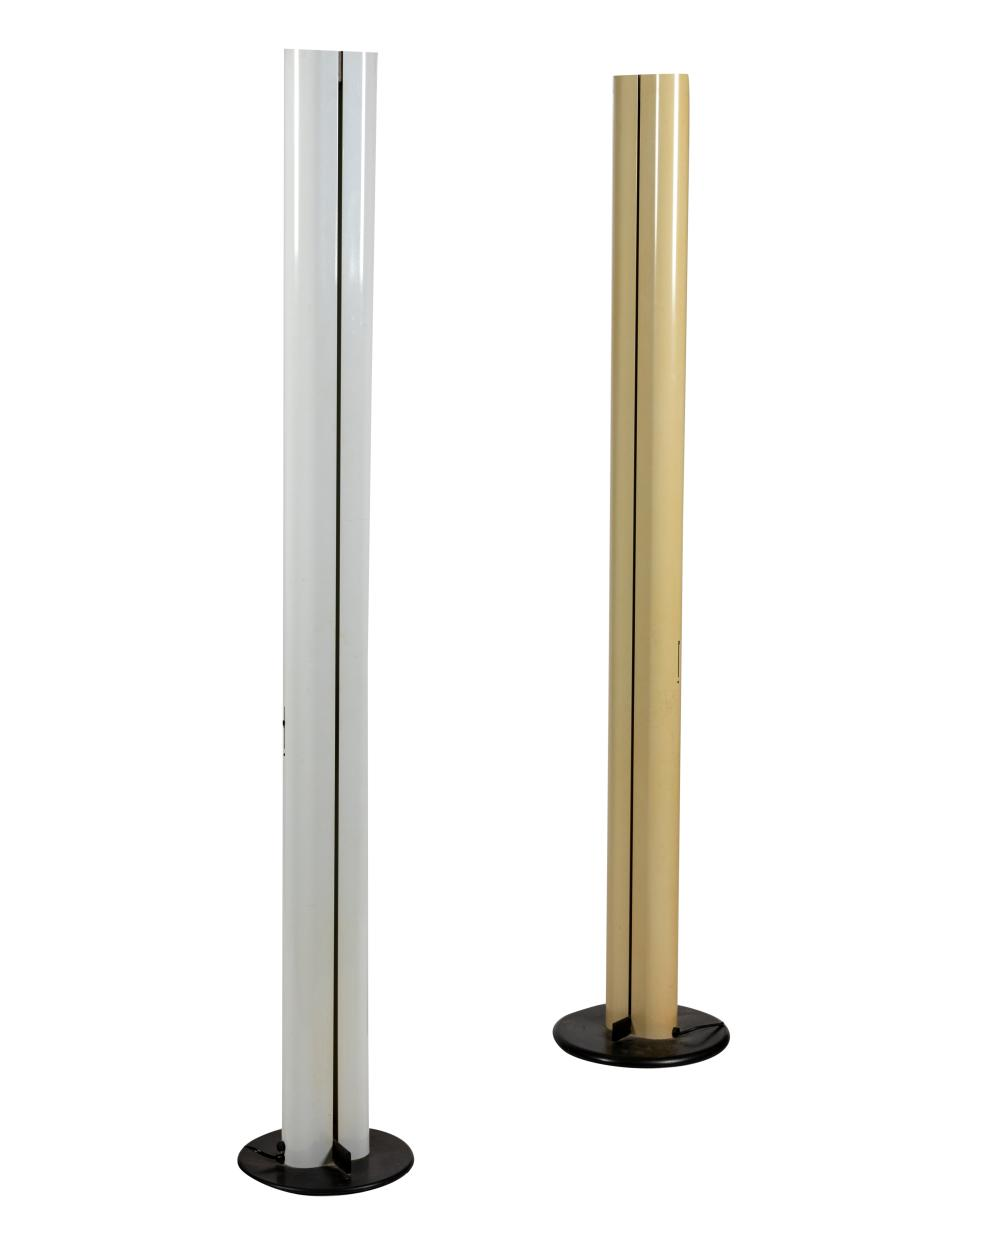 Gianfranco Frattini - Megaron - Floor Lamps - Two